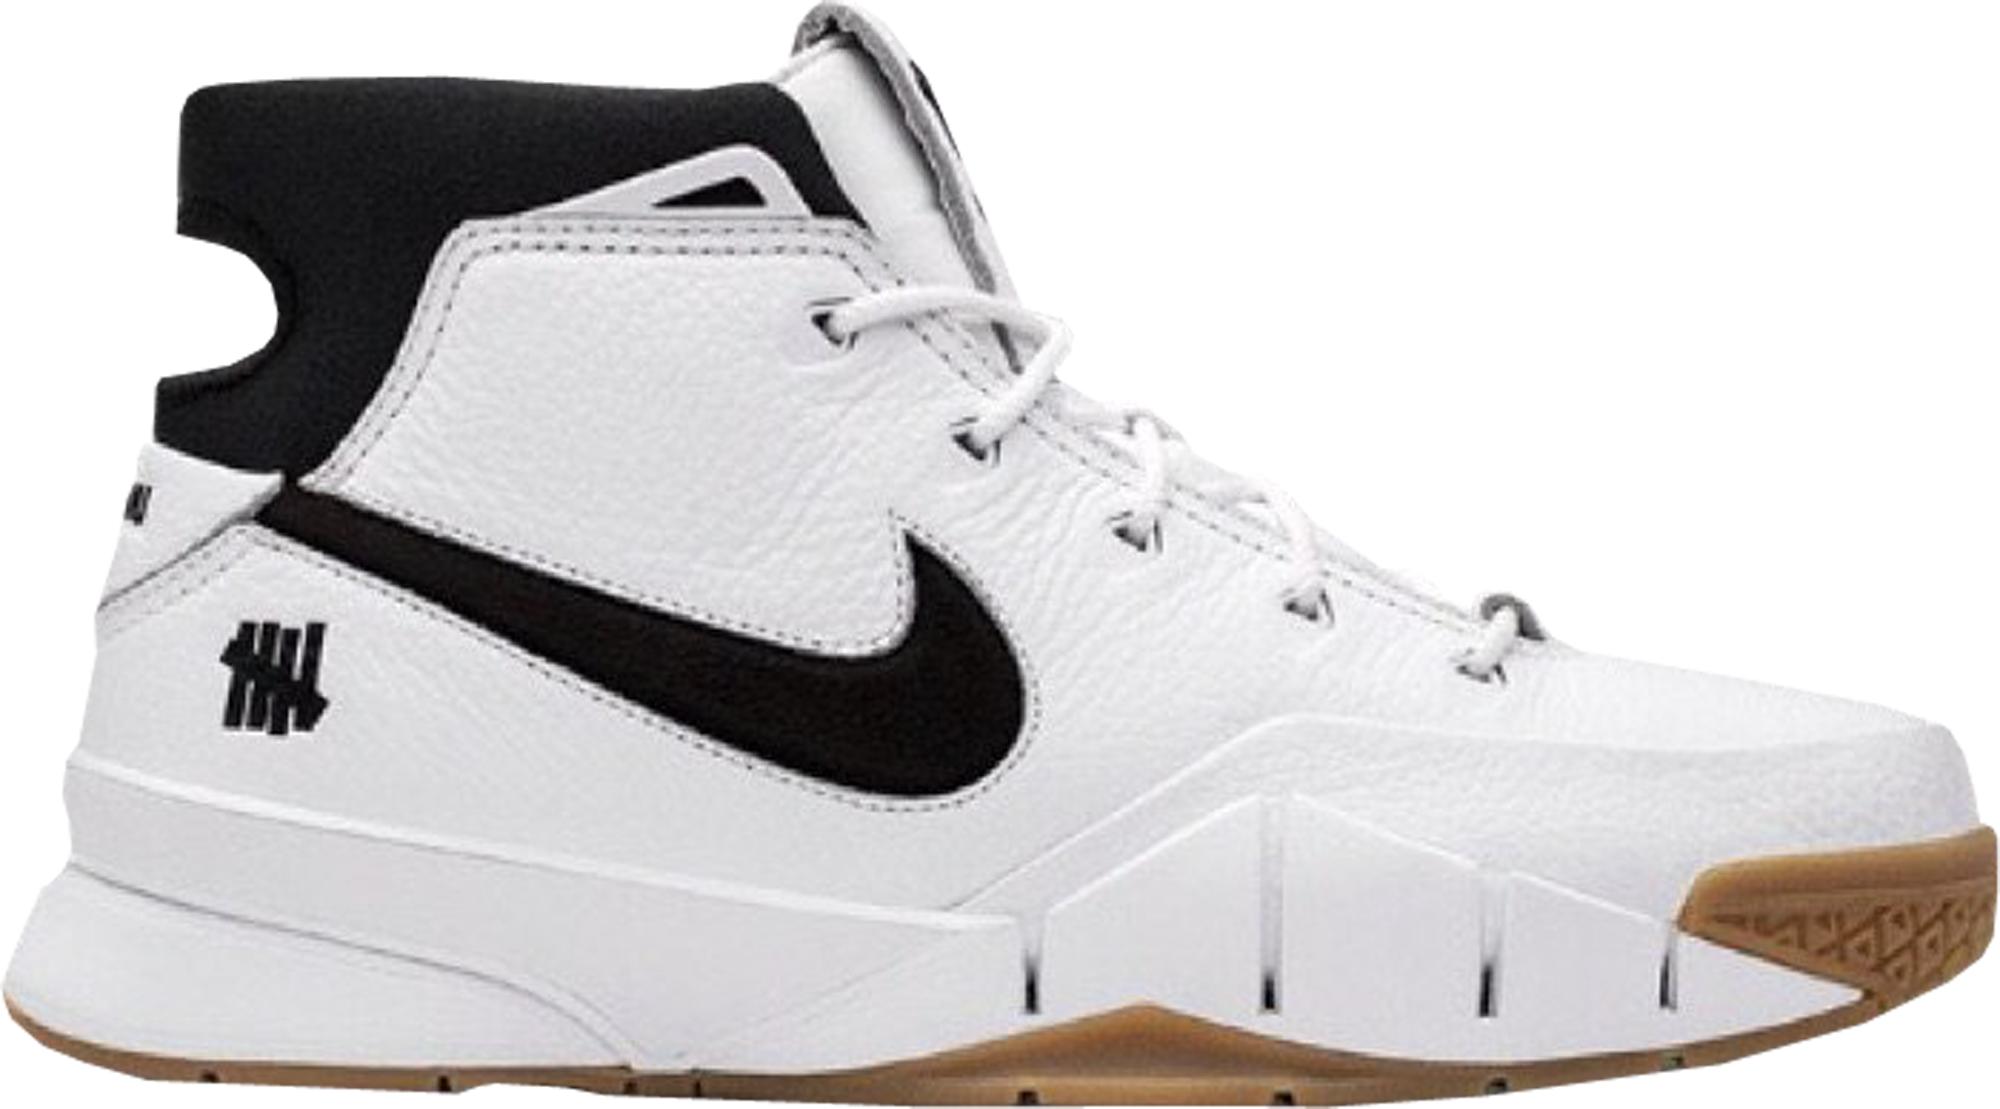 8b669312de2f Undefeated Nike Kobe 1 Protro White